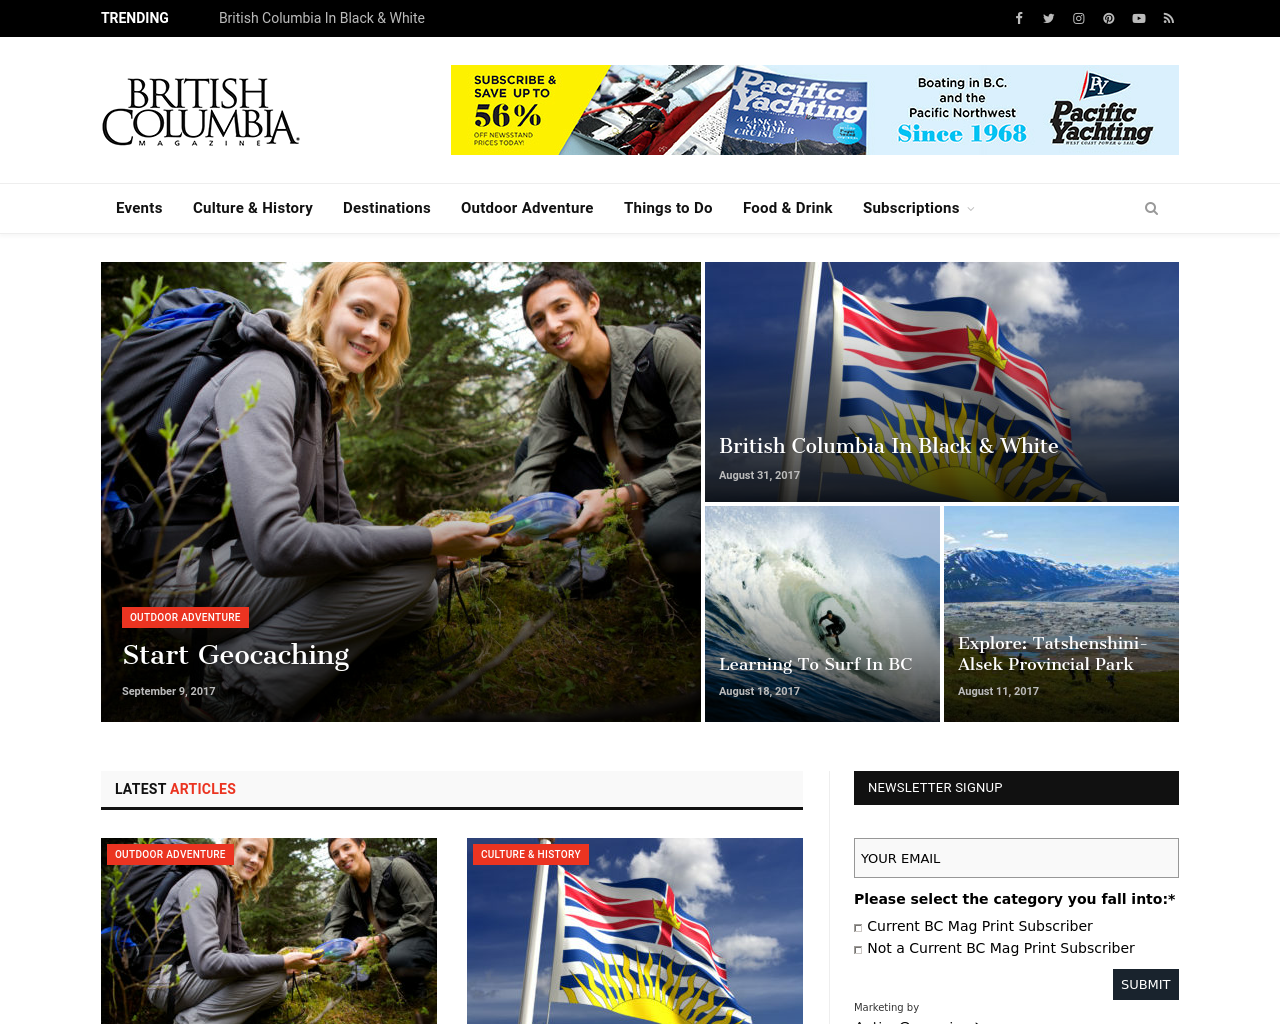 British-Columbia-Magazine-Advertising-Reviews-Pricing